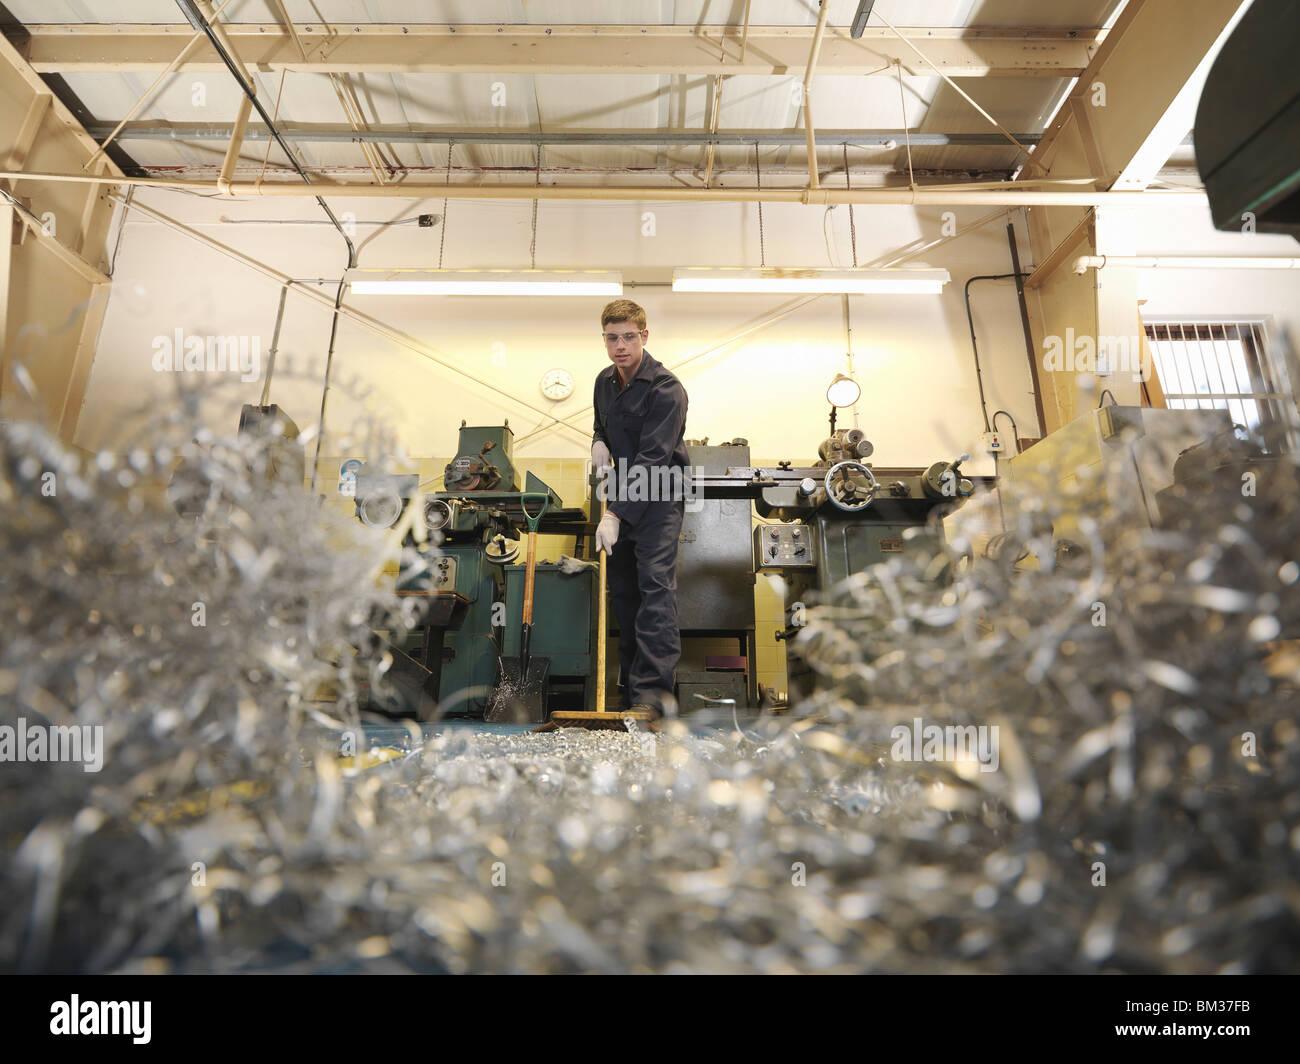 Apprentice Engineer Sweeping Swarf - Stock Image